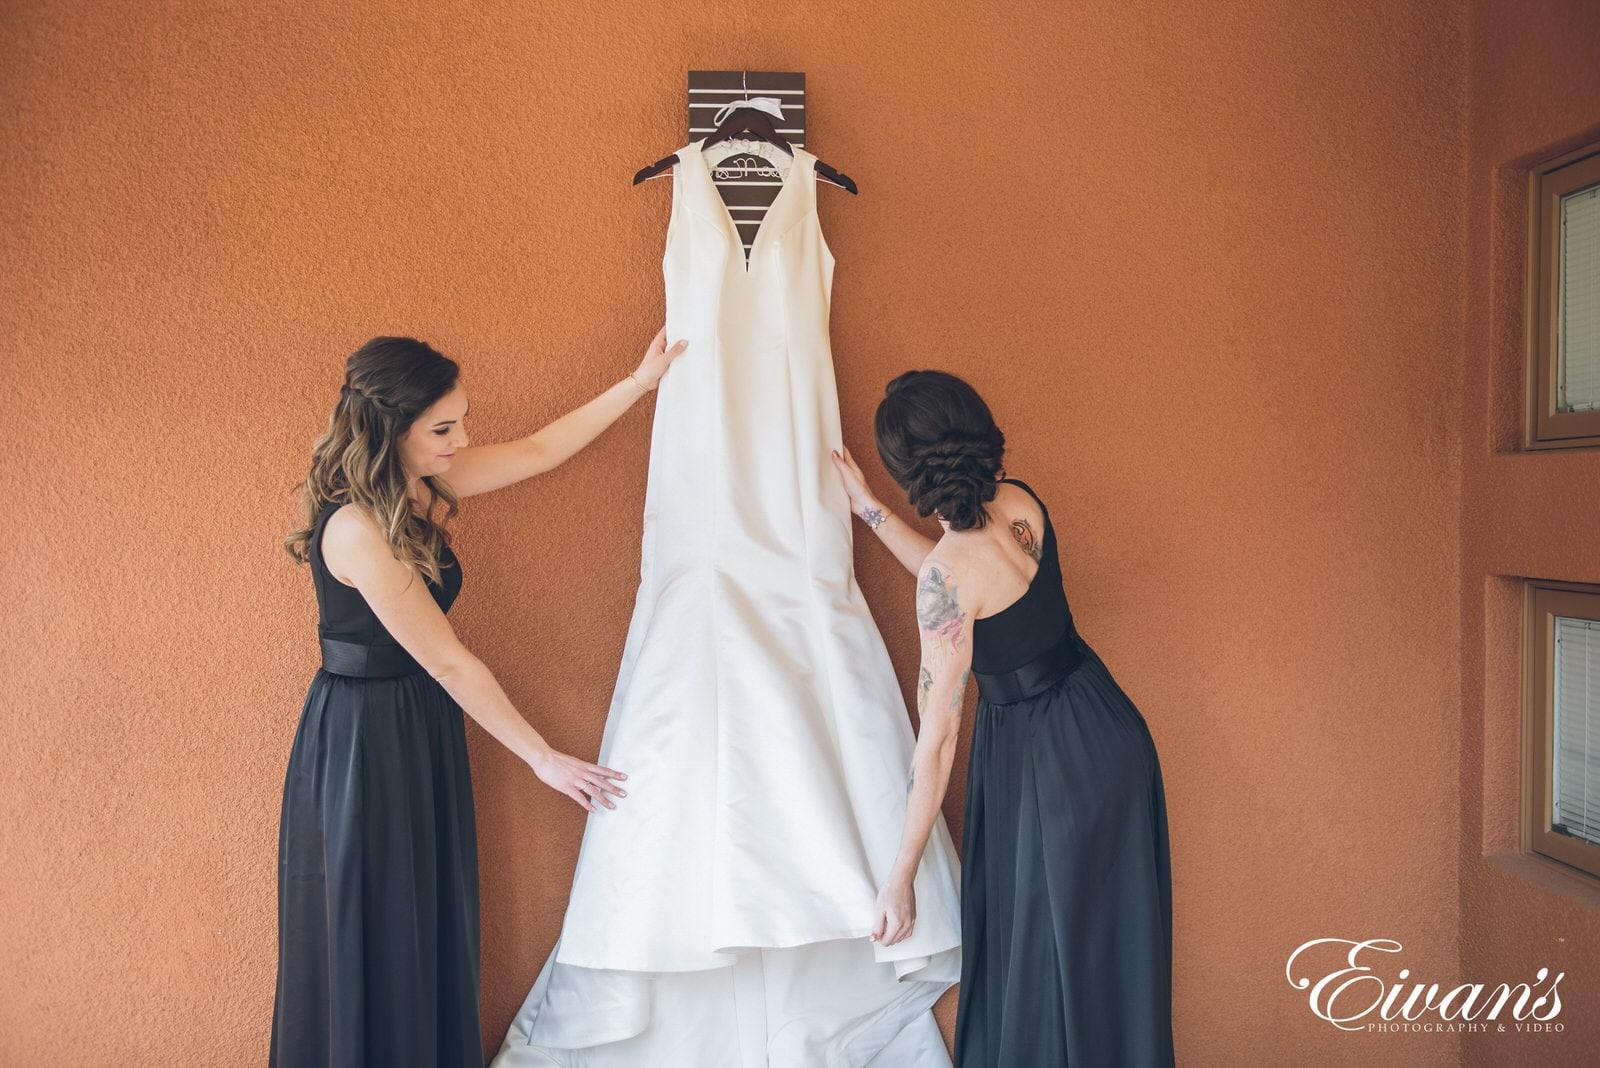 bridesmaids fixing a white wedding dress